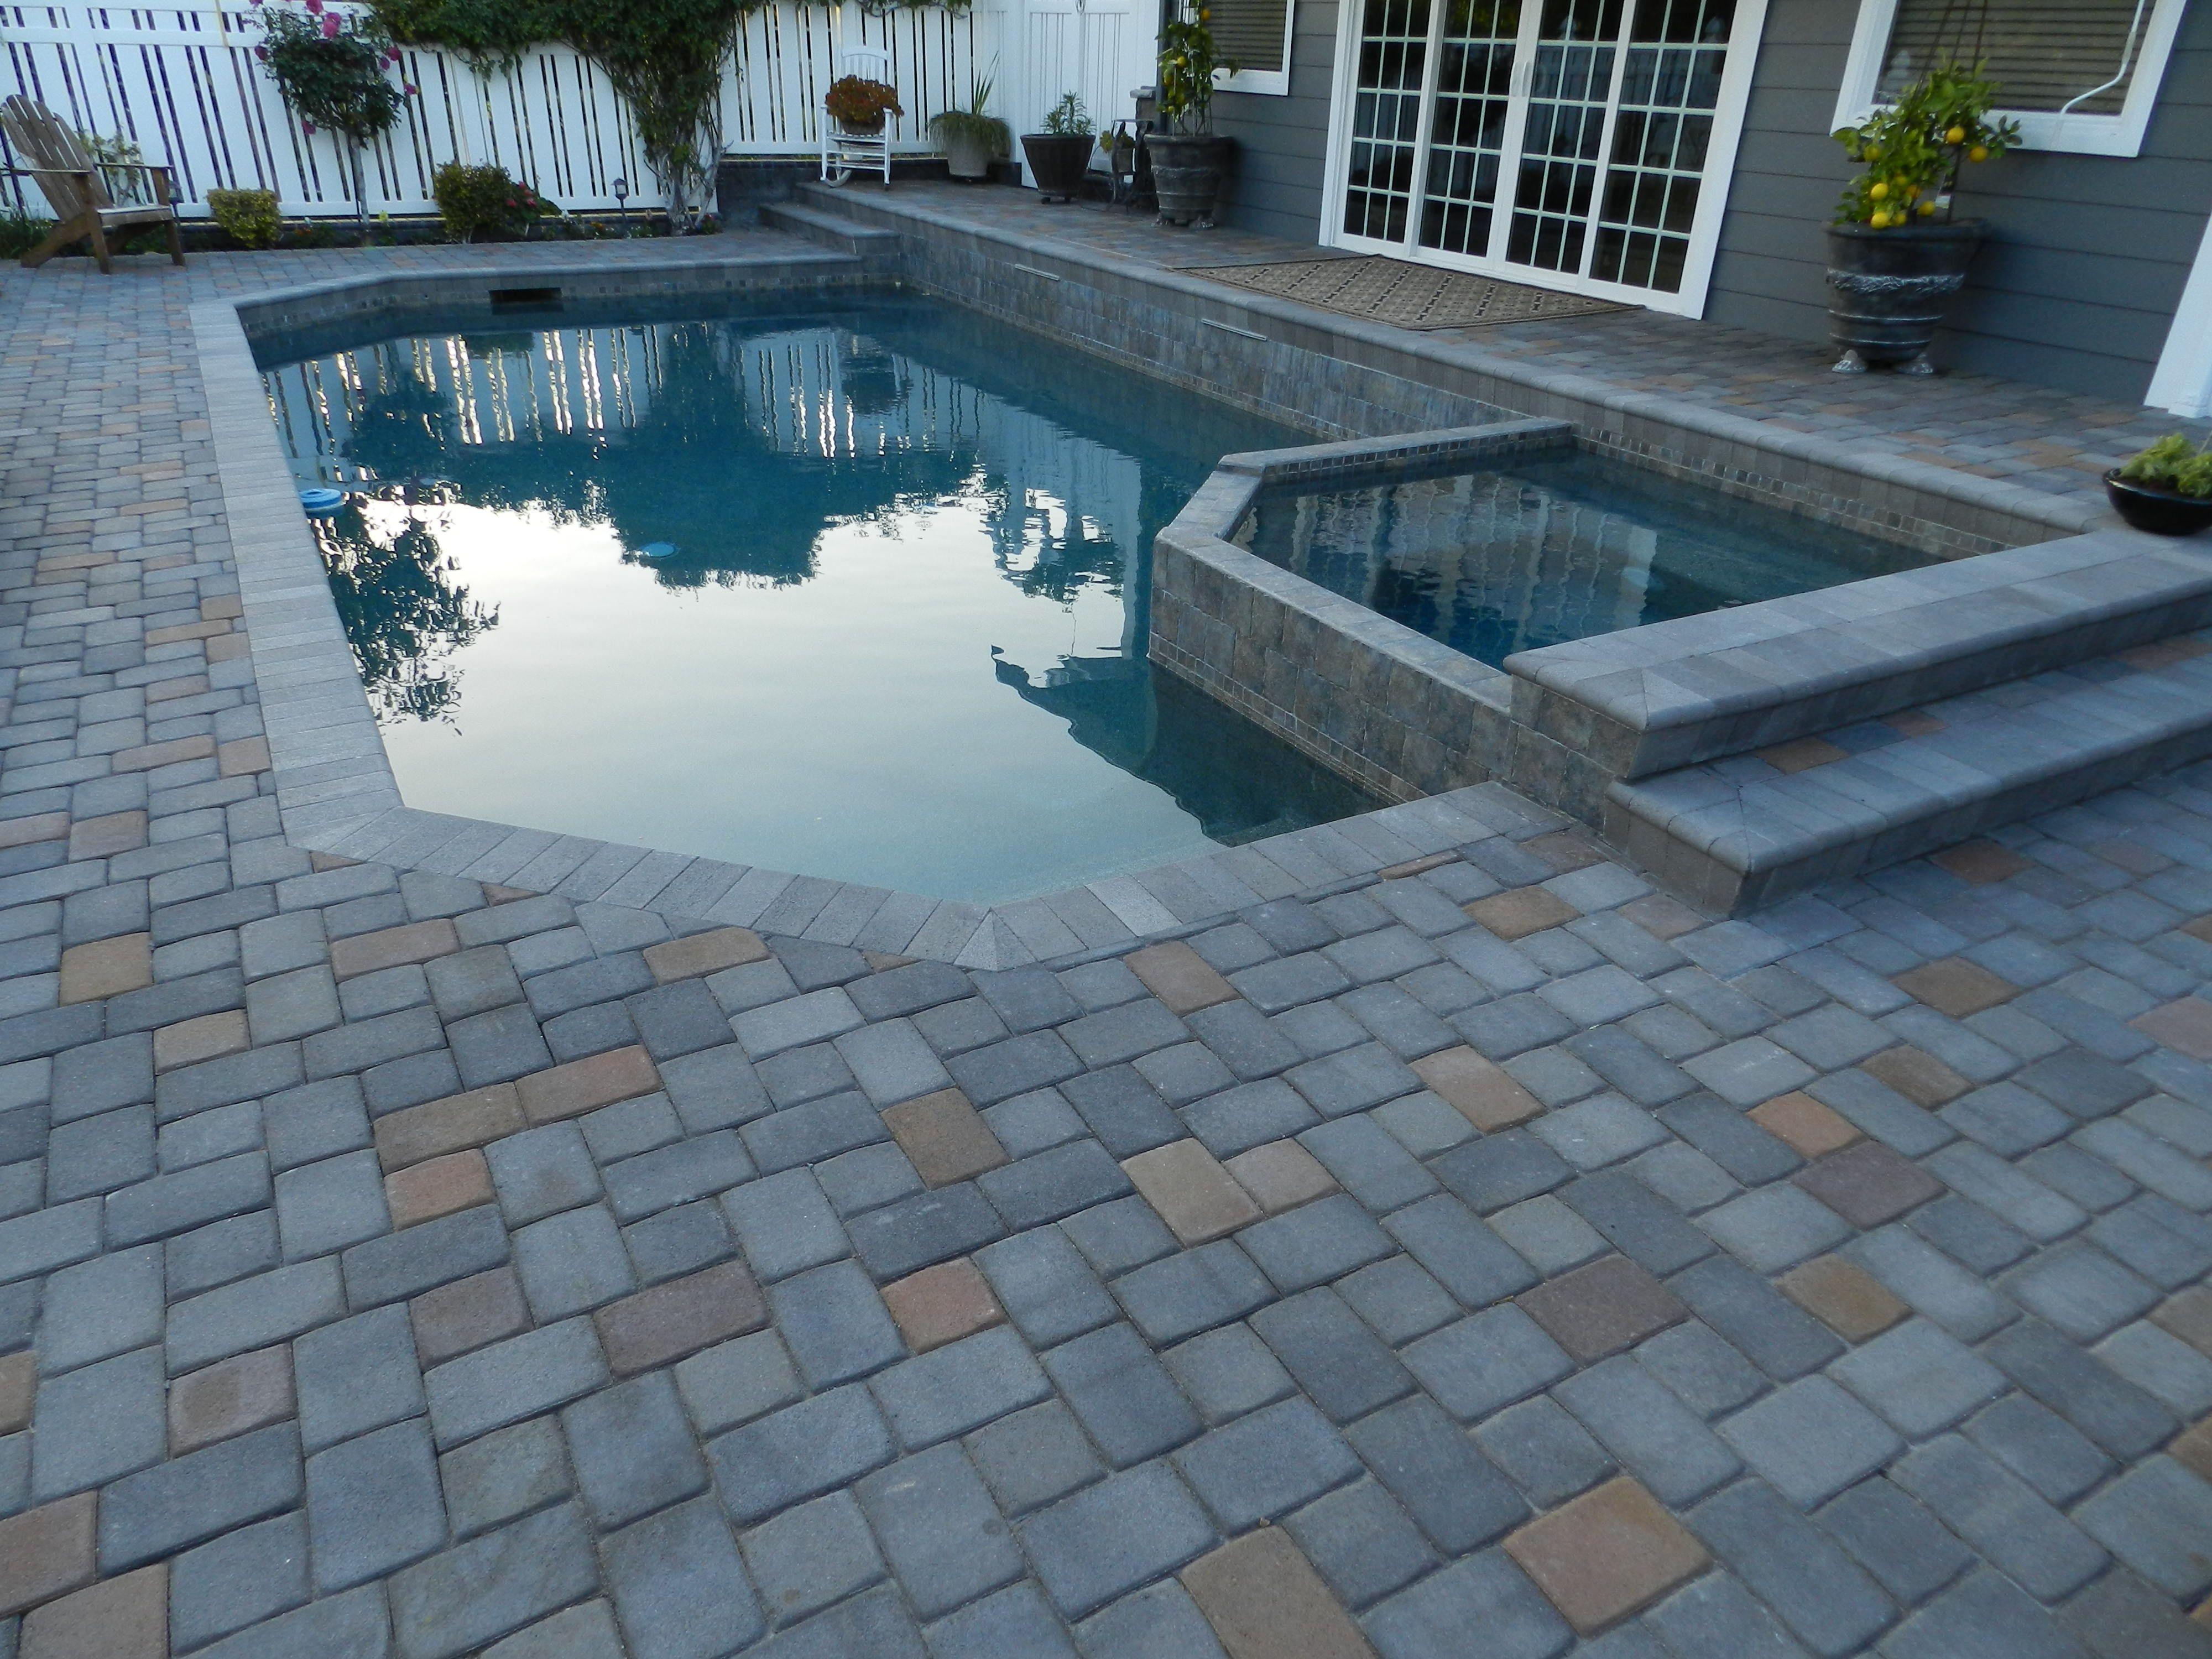 16 best Pool Areas images on Pinterest | Pool spa, Pool decks and ...